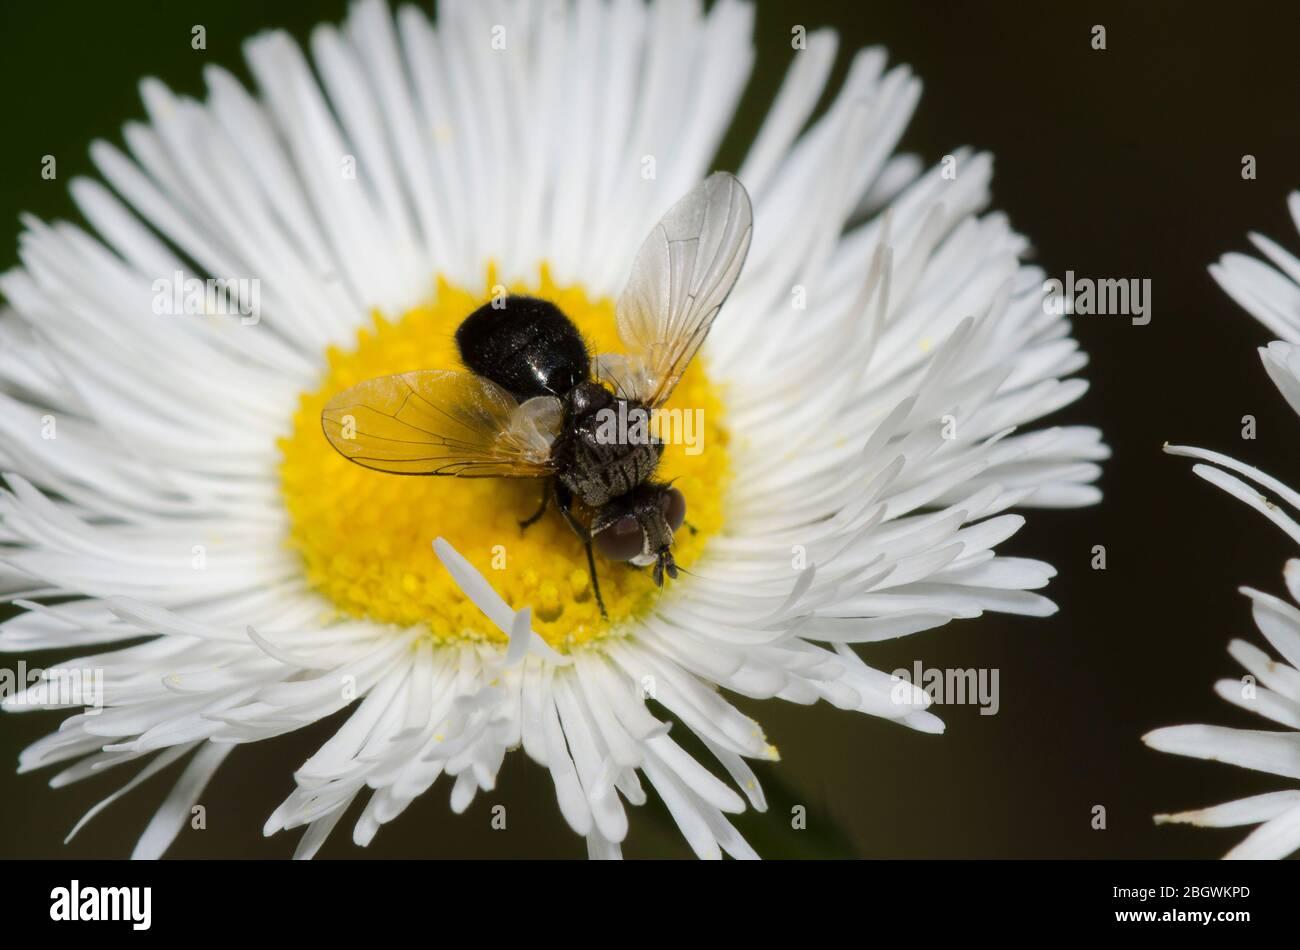 Tachinid Fly, Besseria atra, foraging on Fleabane, Erigeron sp. Stock Photo